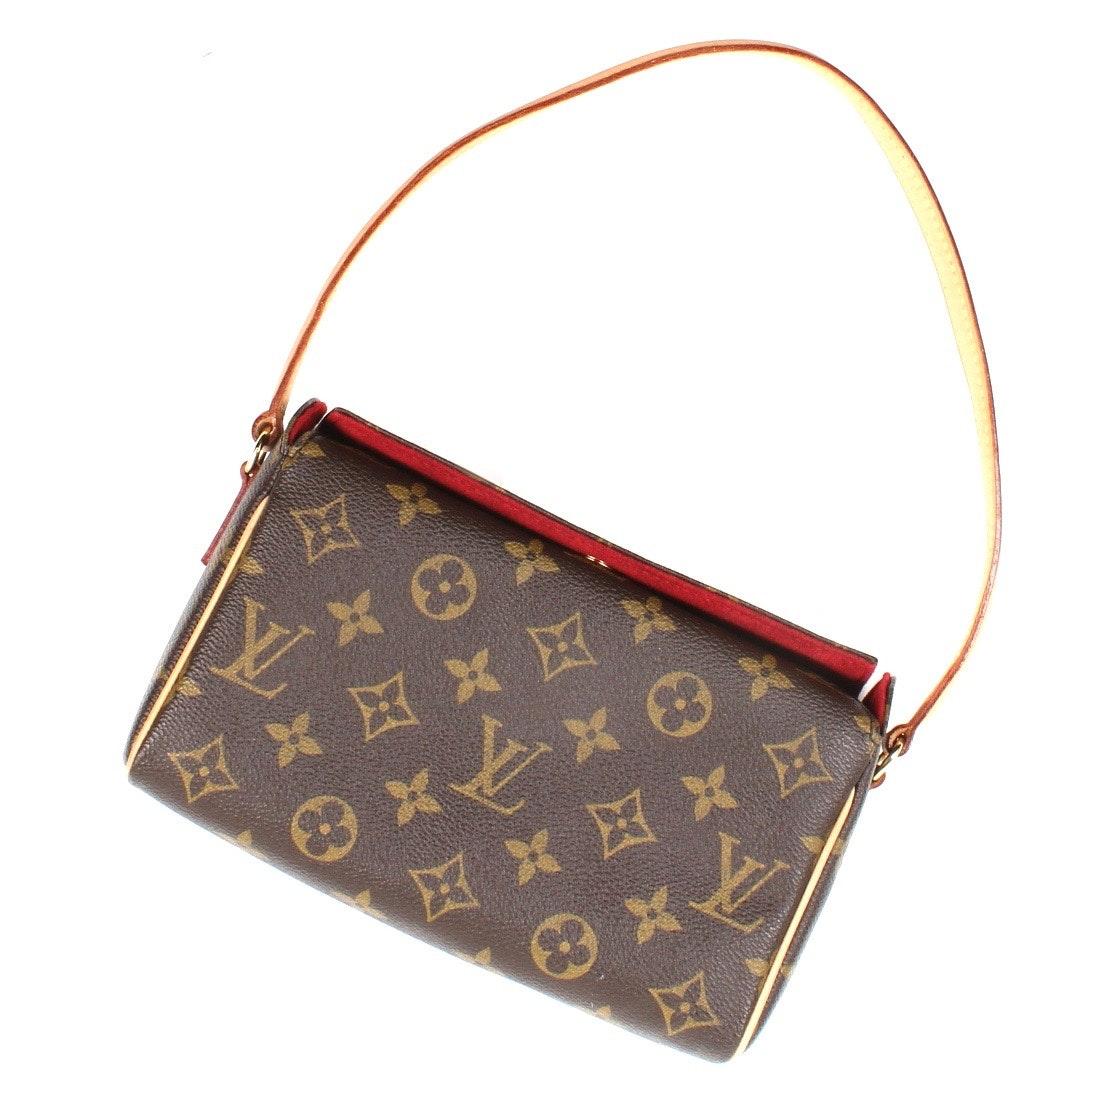 Louis Vuitton Authentic Monogram Recital Pochette Handbag